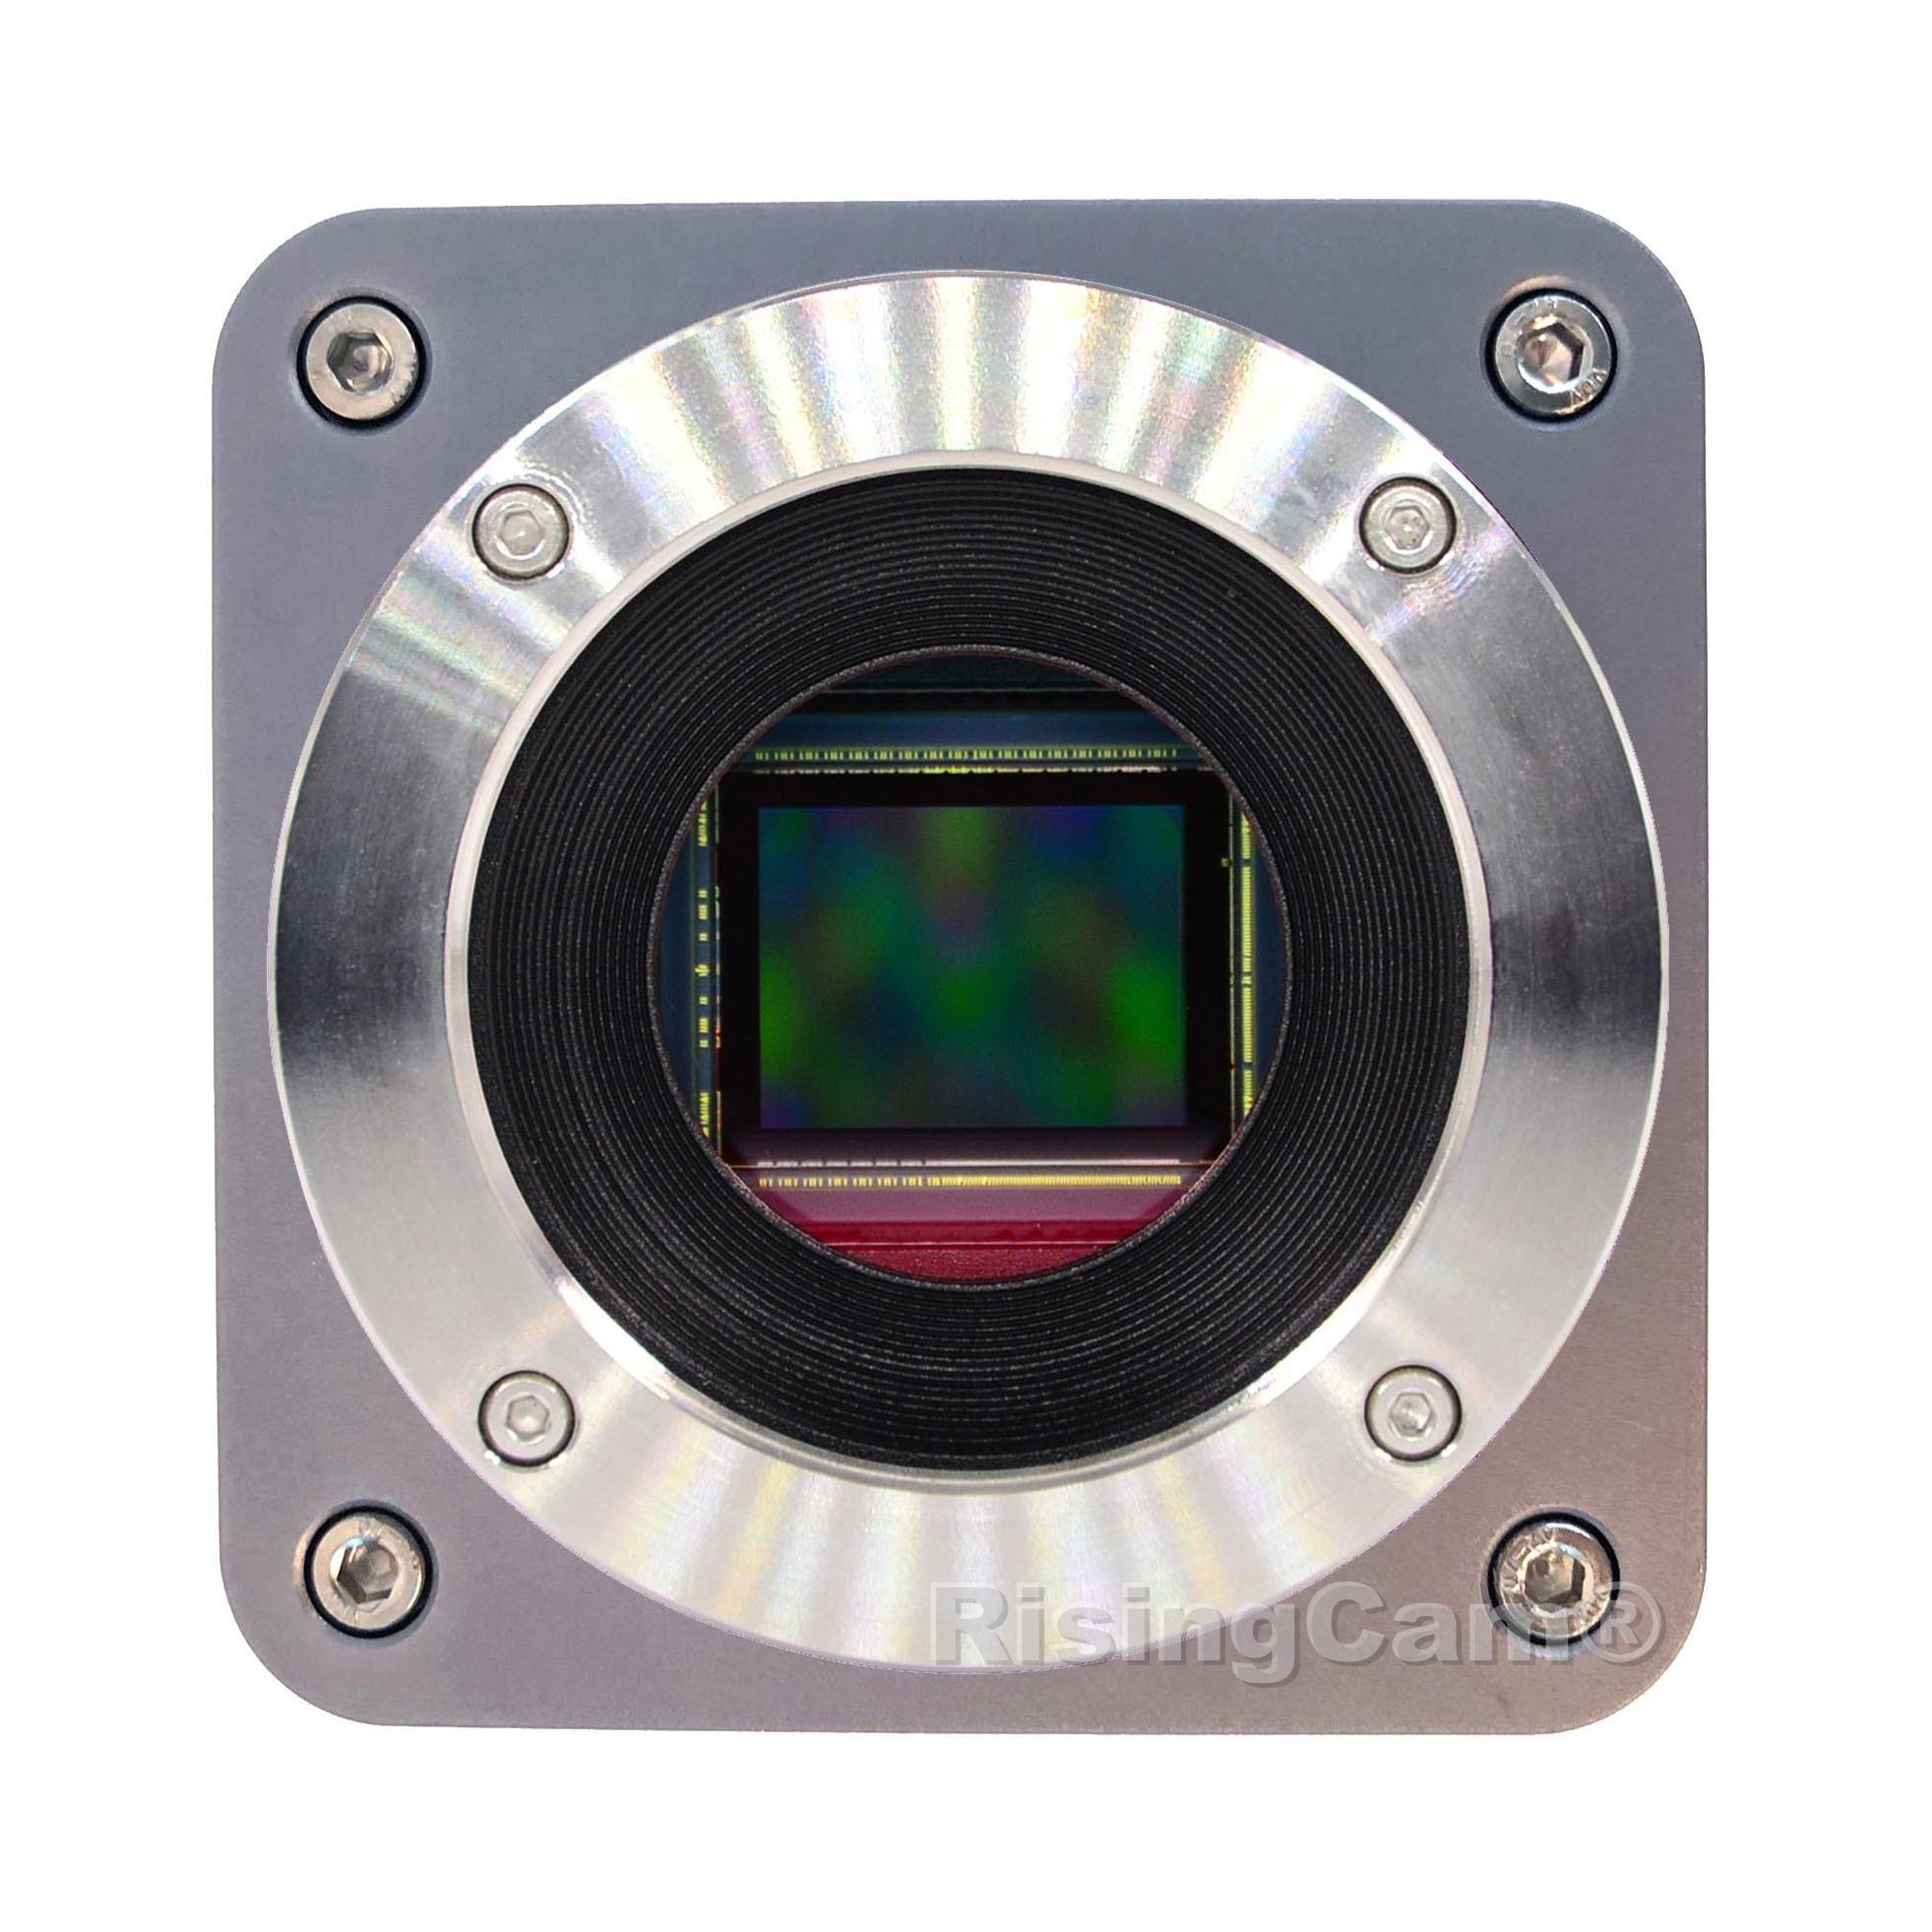 "Image 5 - BigEYE USB3.0 10mp SONY imx294 4/3"" CMOS Digital Microscope camera with M42 and C mount for trinocular biological microscopeMicroscopes   -"